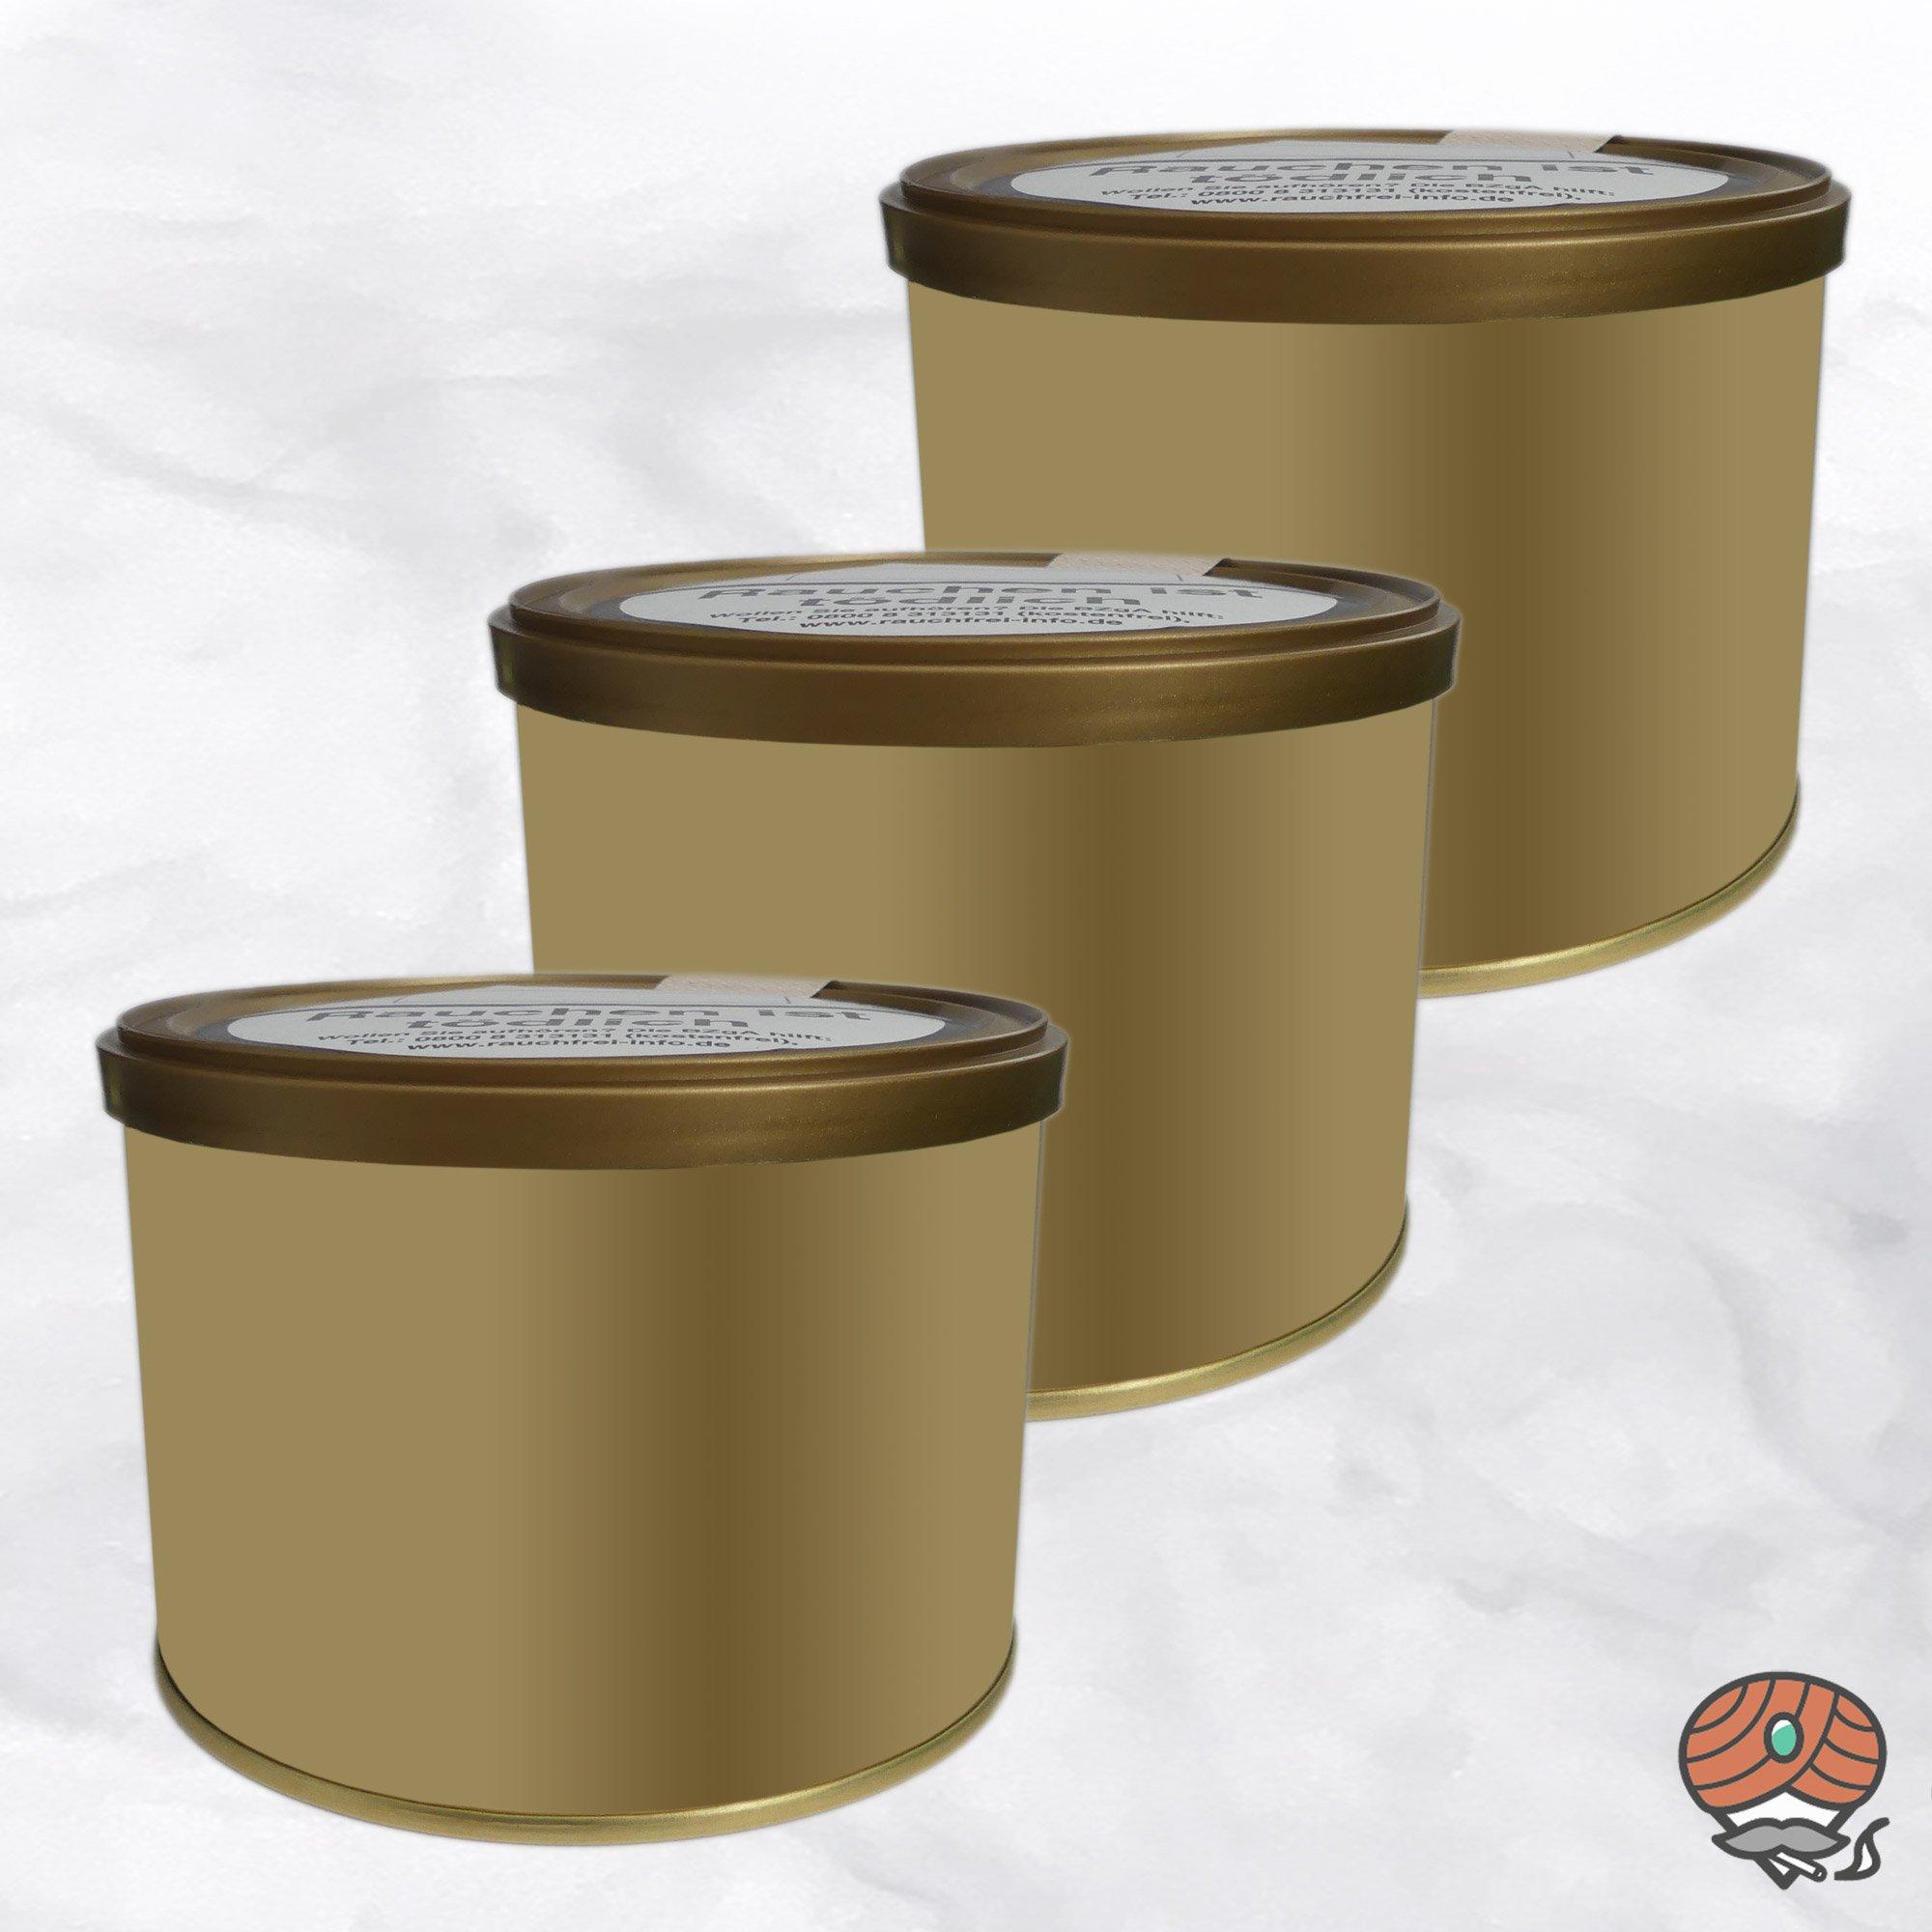 3 x Pfeifentabak EM 222 - Bourbon Vanille Aroma, 100g Dose